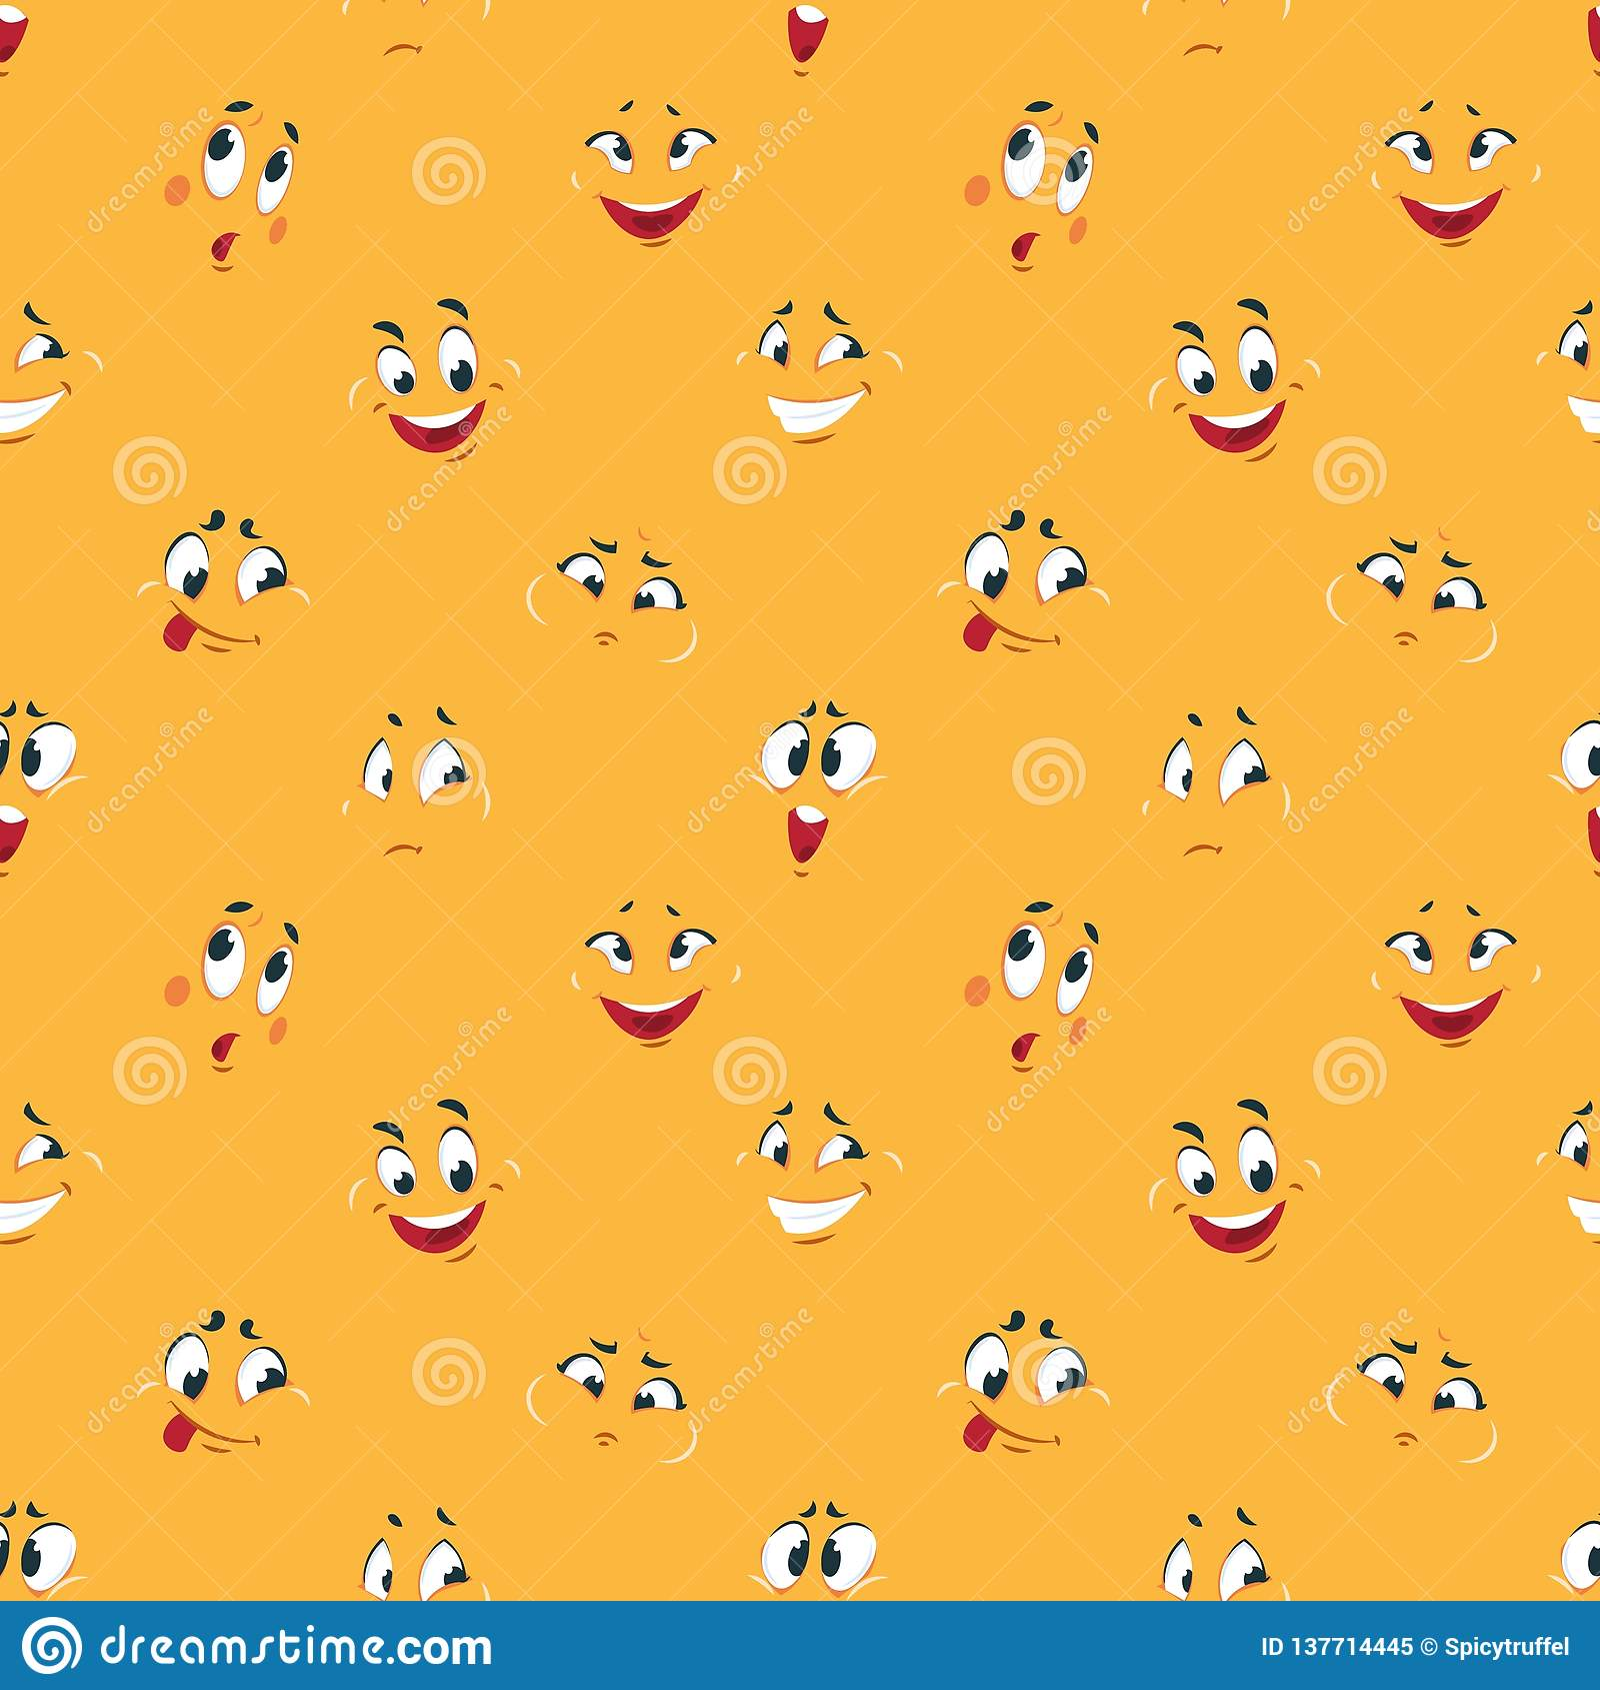 cartoon smiley pattern funny